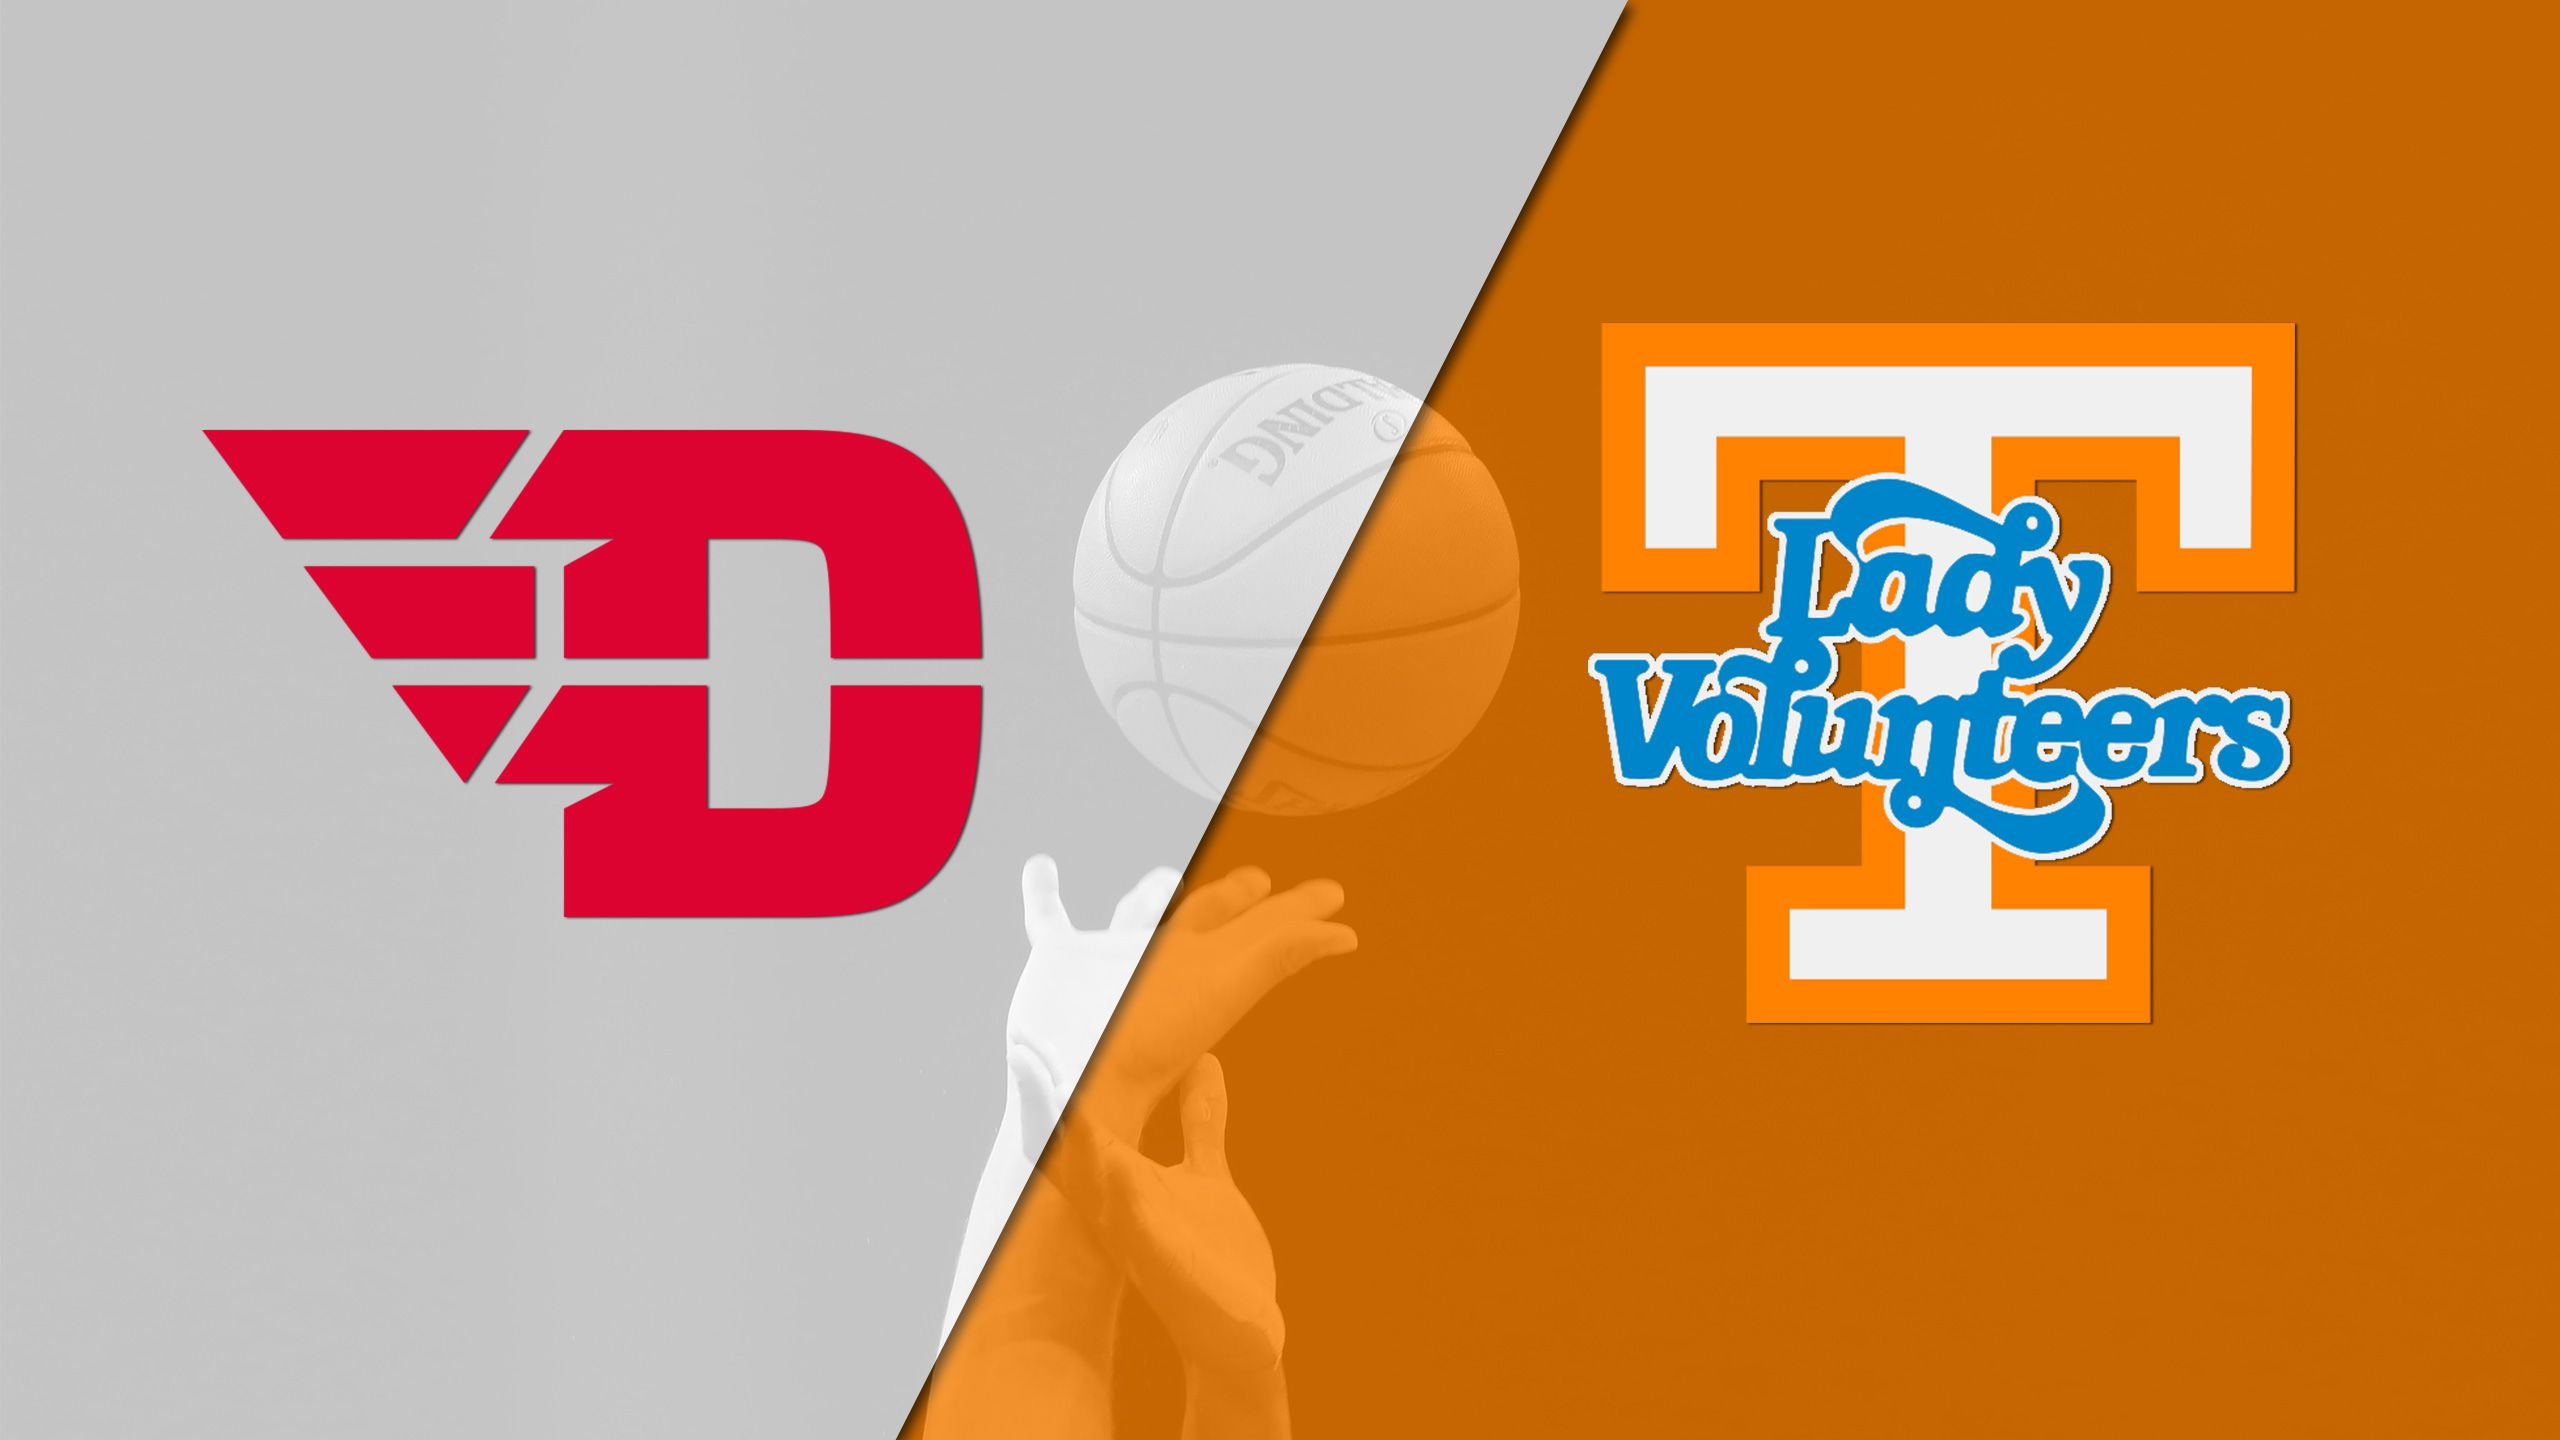 #12 Dayton vs. #5 Tennessee (First Round) (NCAA Women's Basketball Championship)